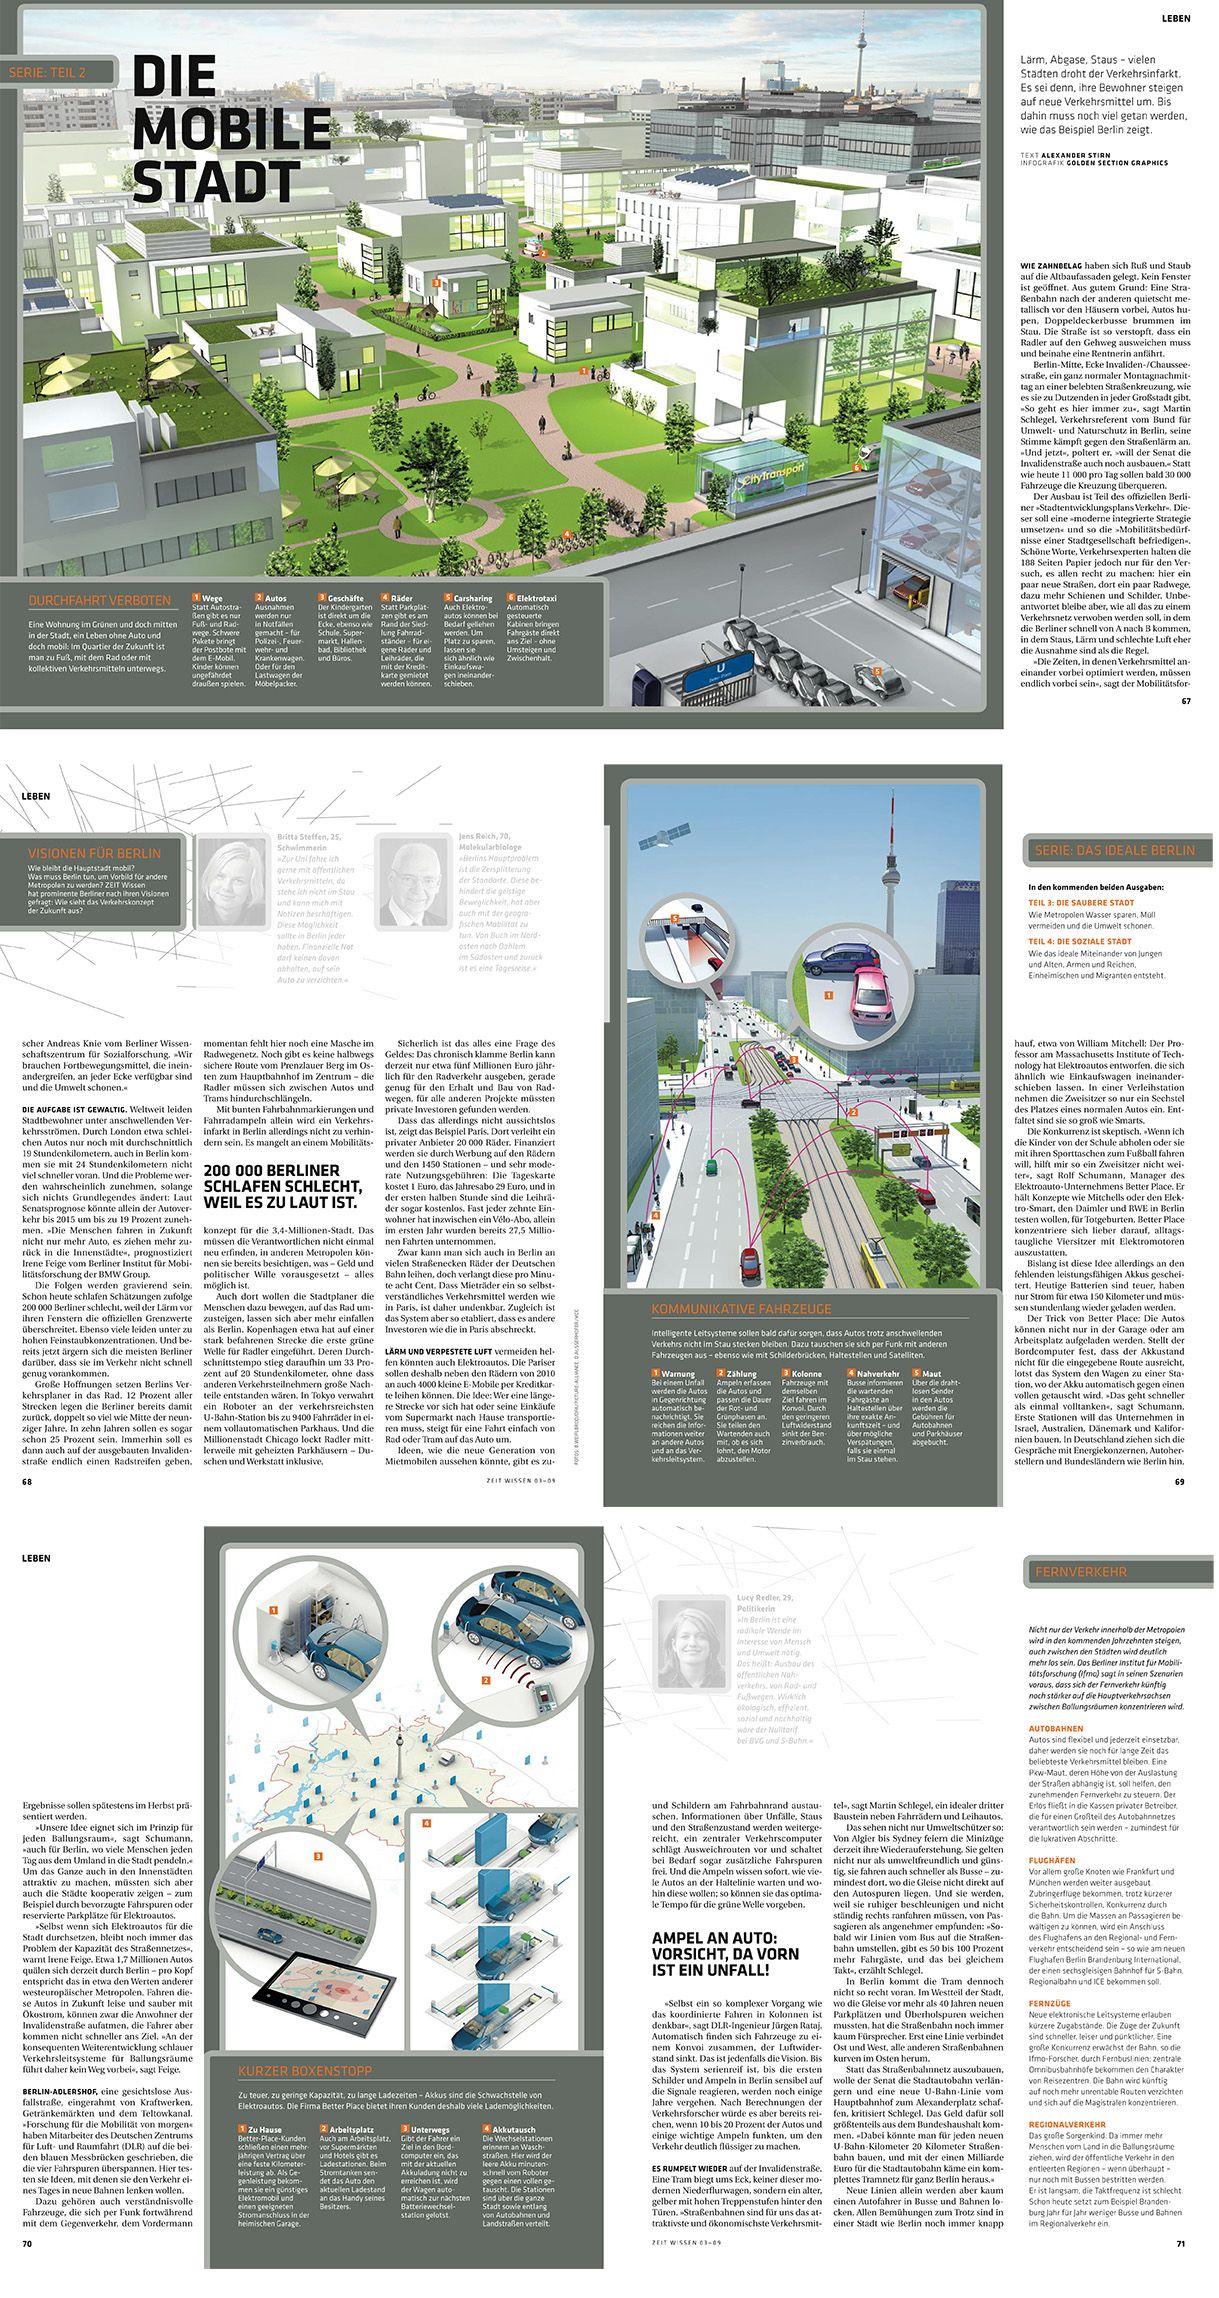 0235 Zeit Wissen Magazine Mobile City Infographics Infographie